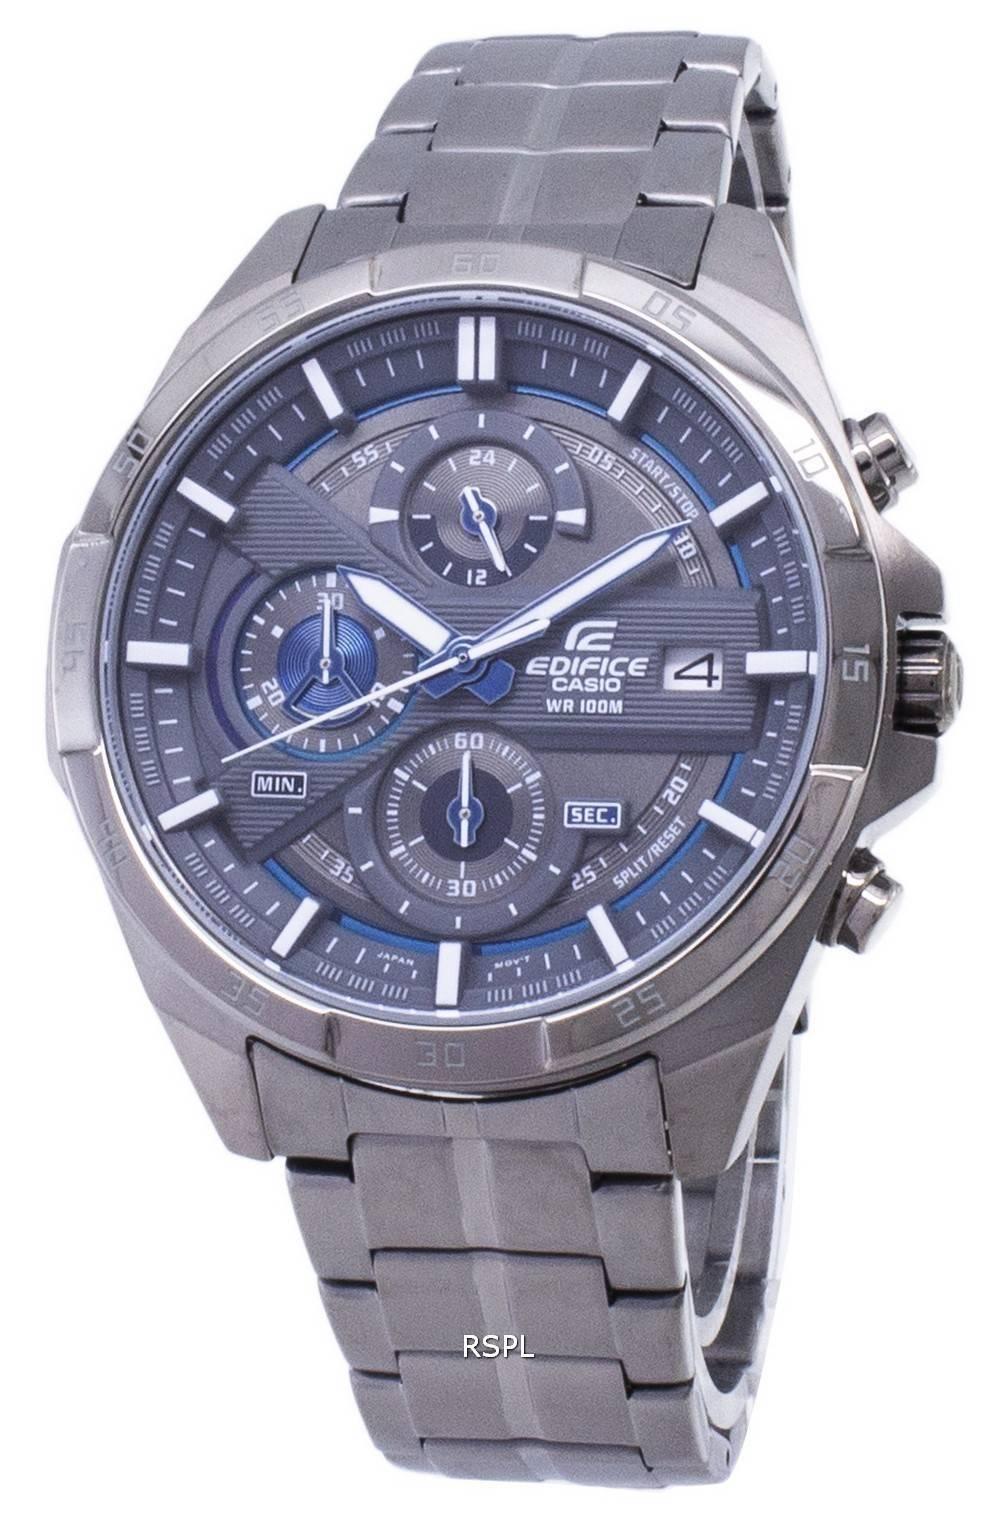 Casio Edifice EFR-556GY-1AV EFR556GY-1AV Chronograph Analog Men's Watch